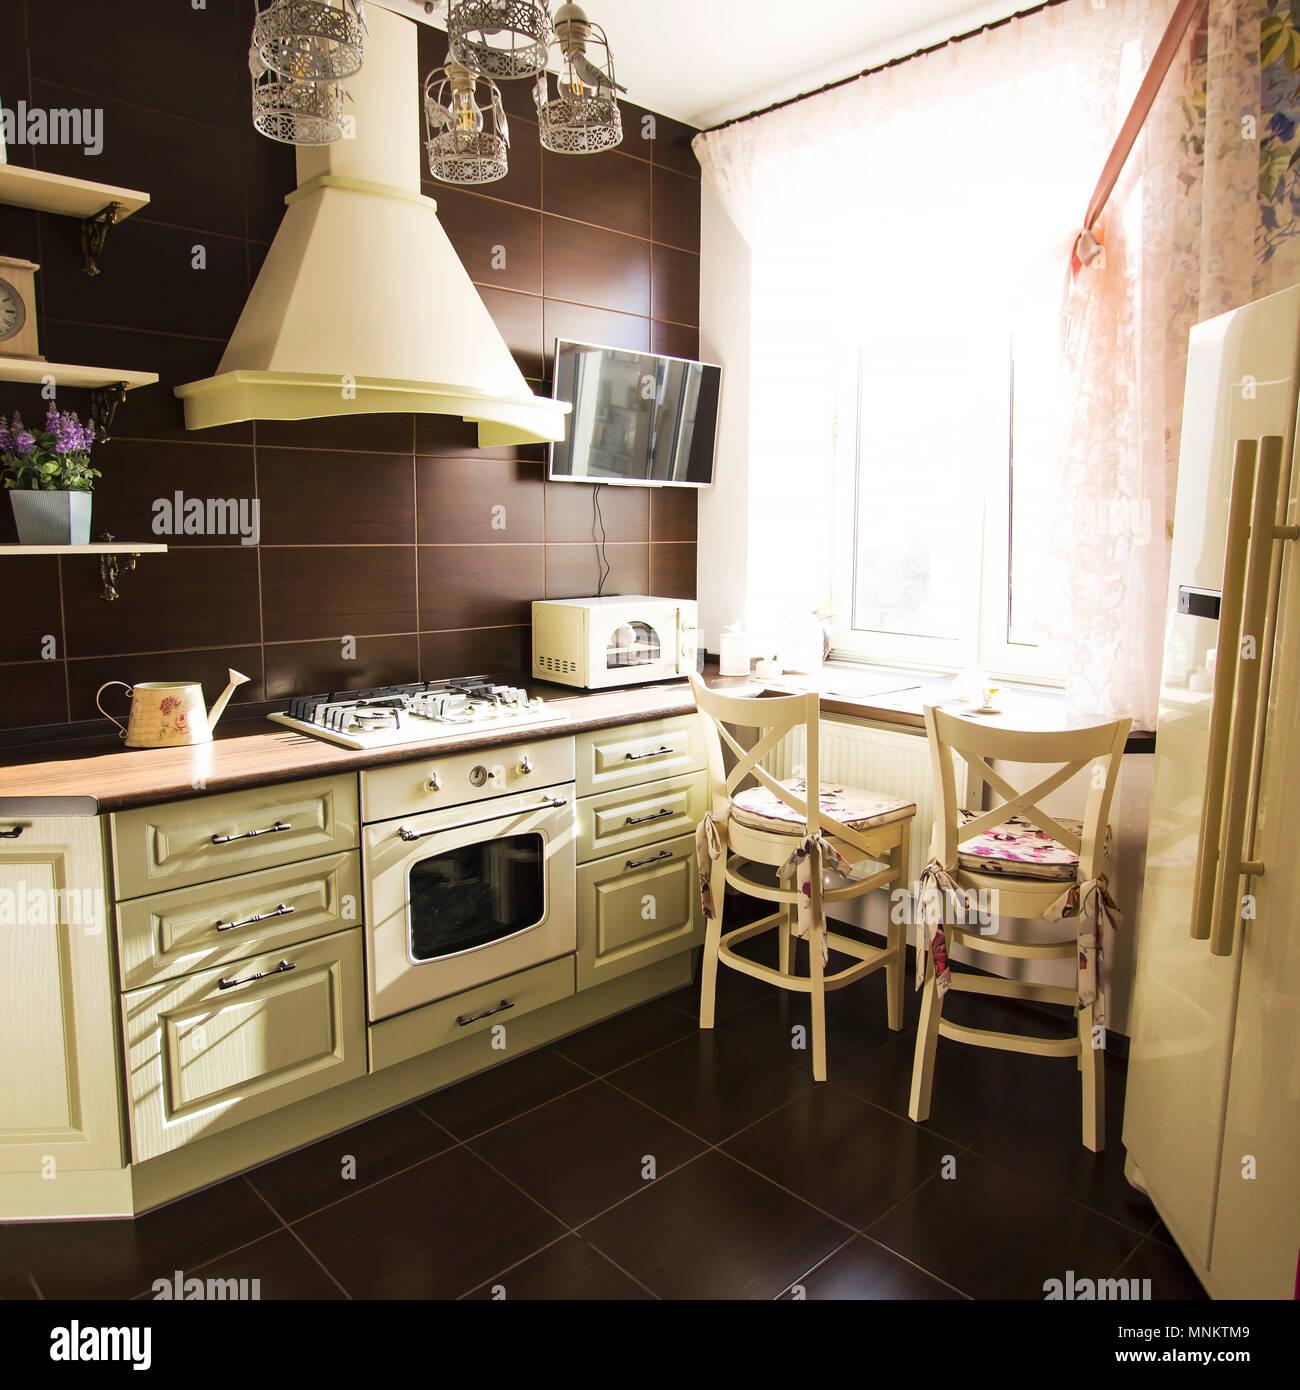 Cucina interno in colori luminosi stufa frigorifero sedie stile ...